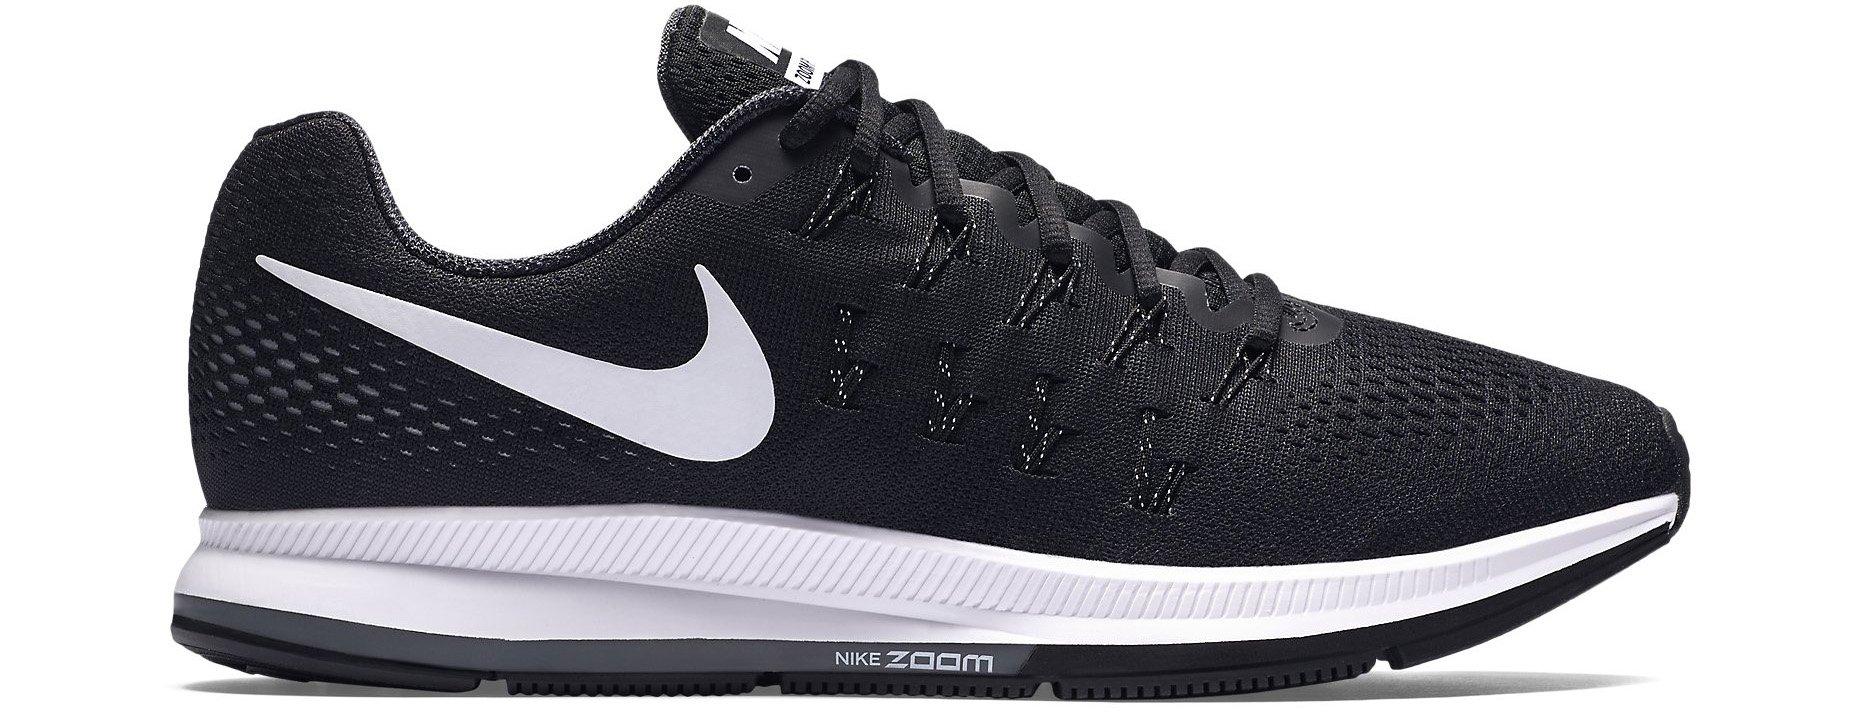 Běžecká obuv Nike Air Zoom Pegasus 33